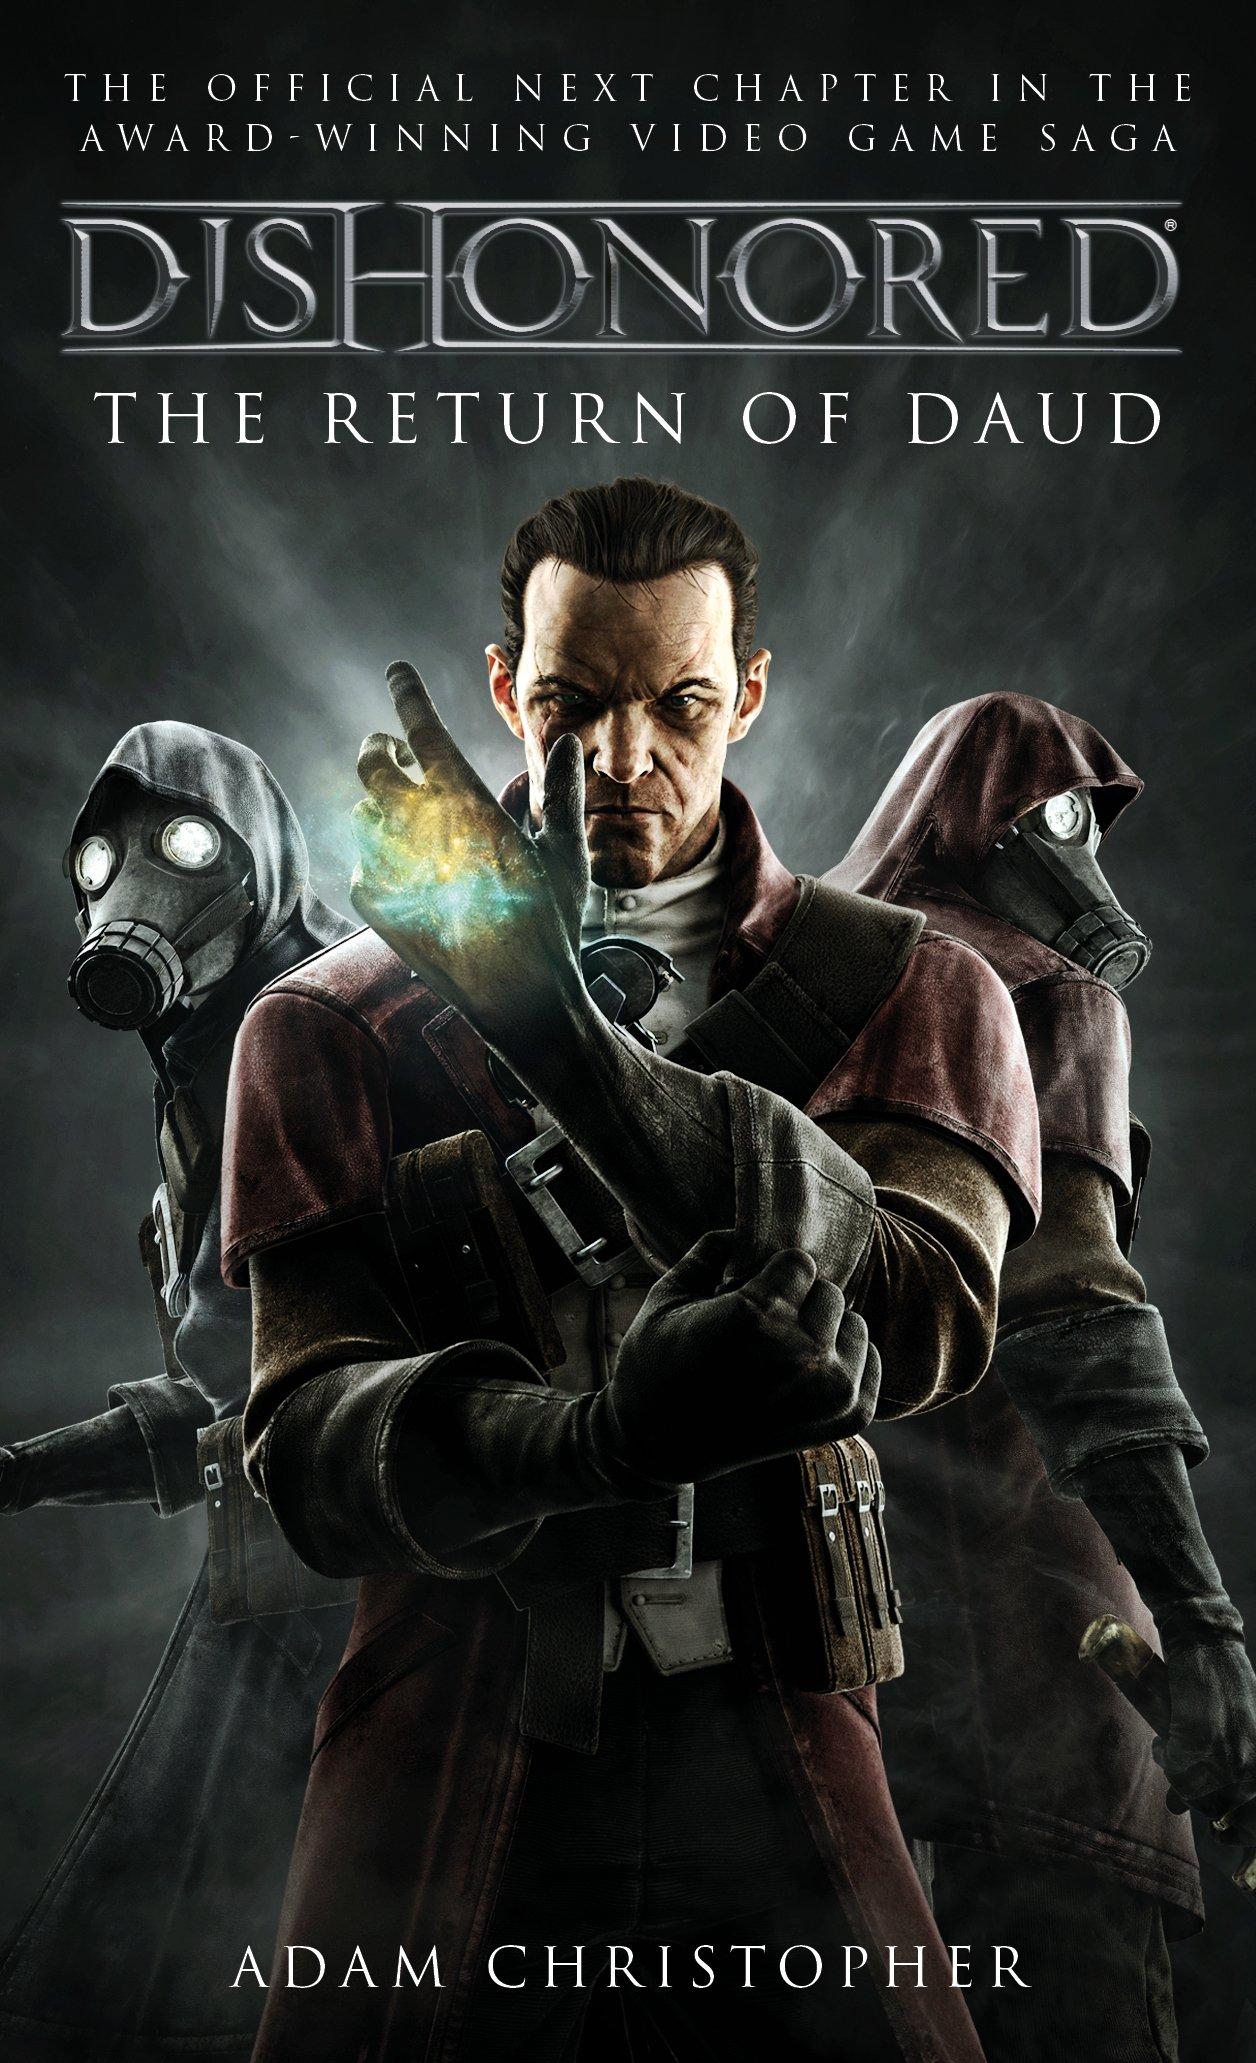 Dishonored: The Return of Daud